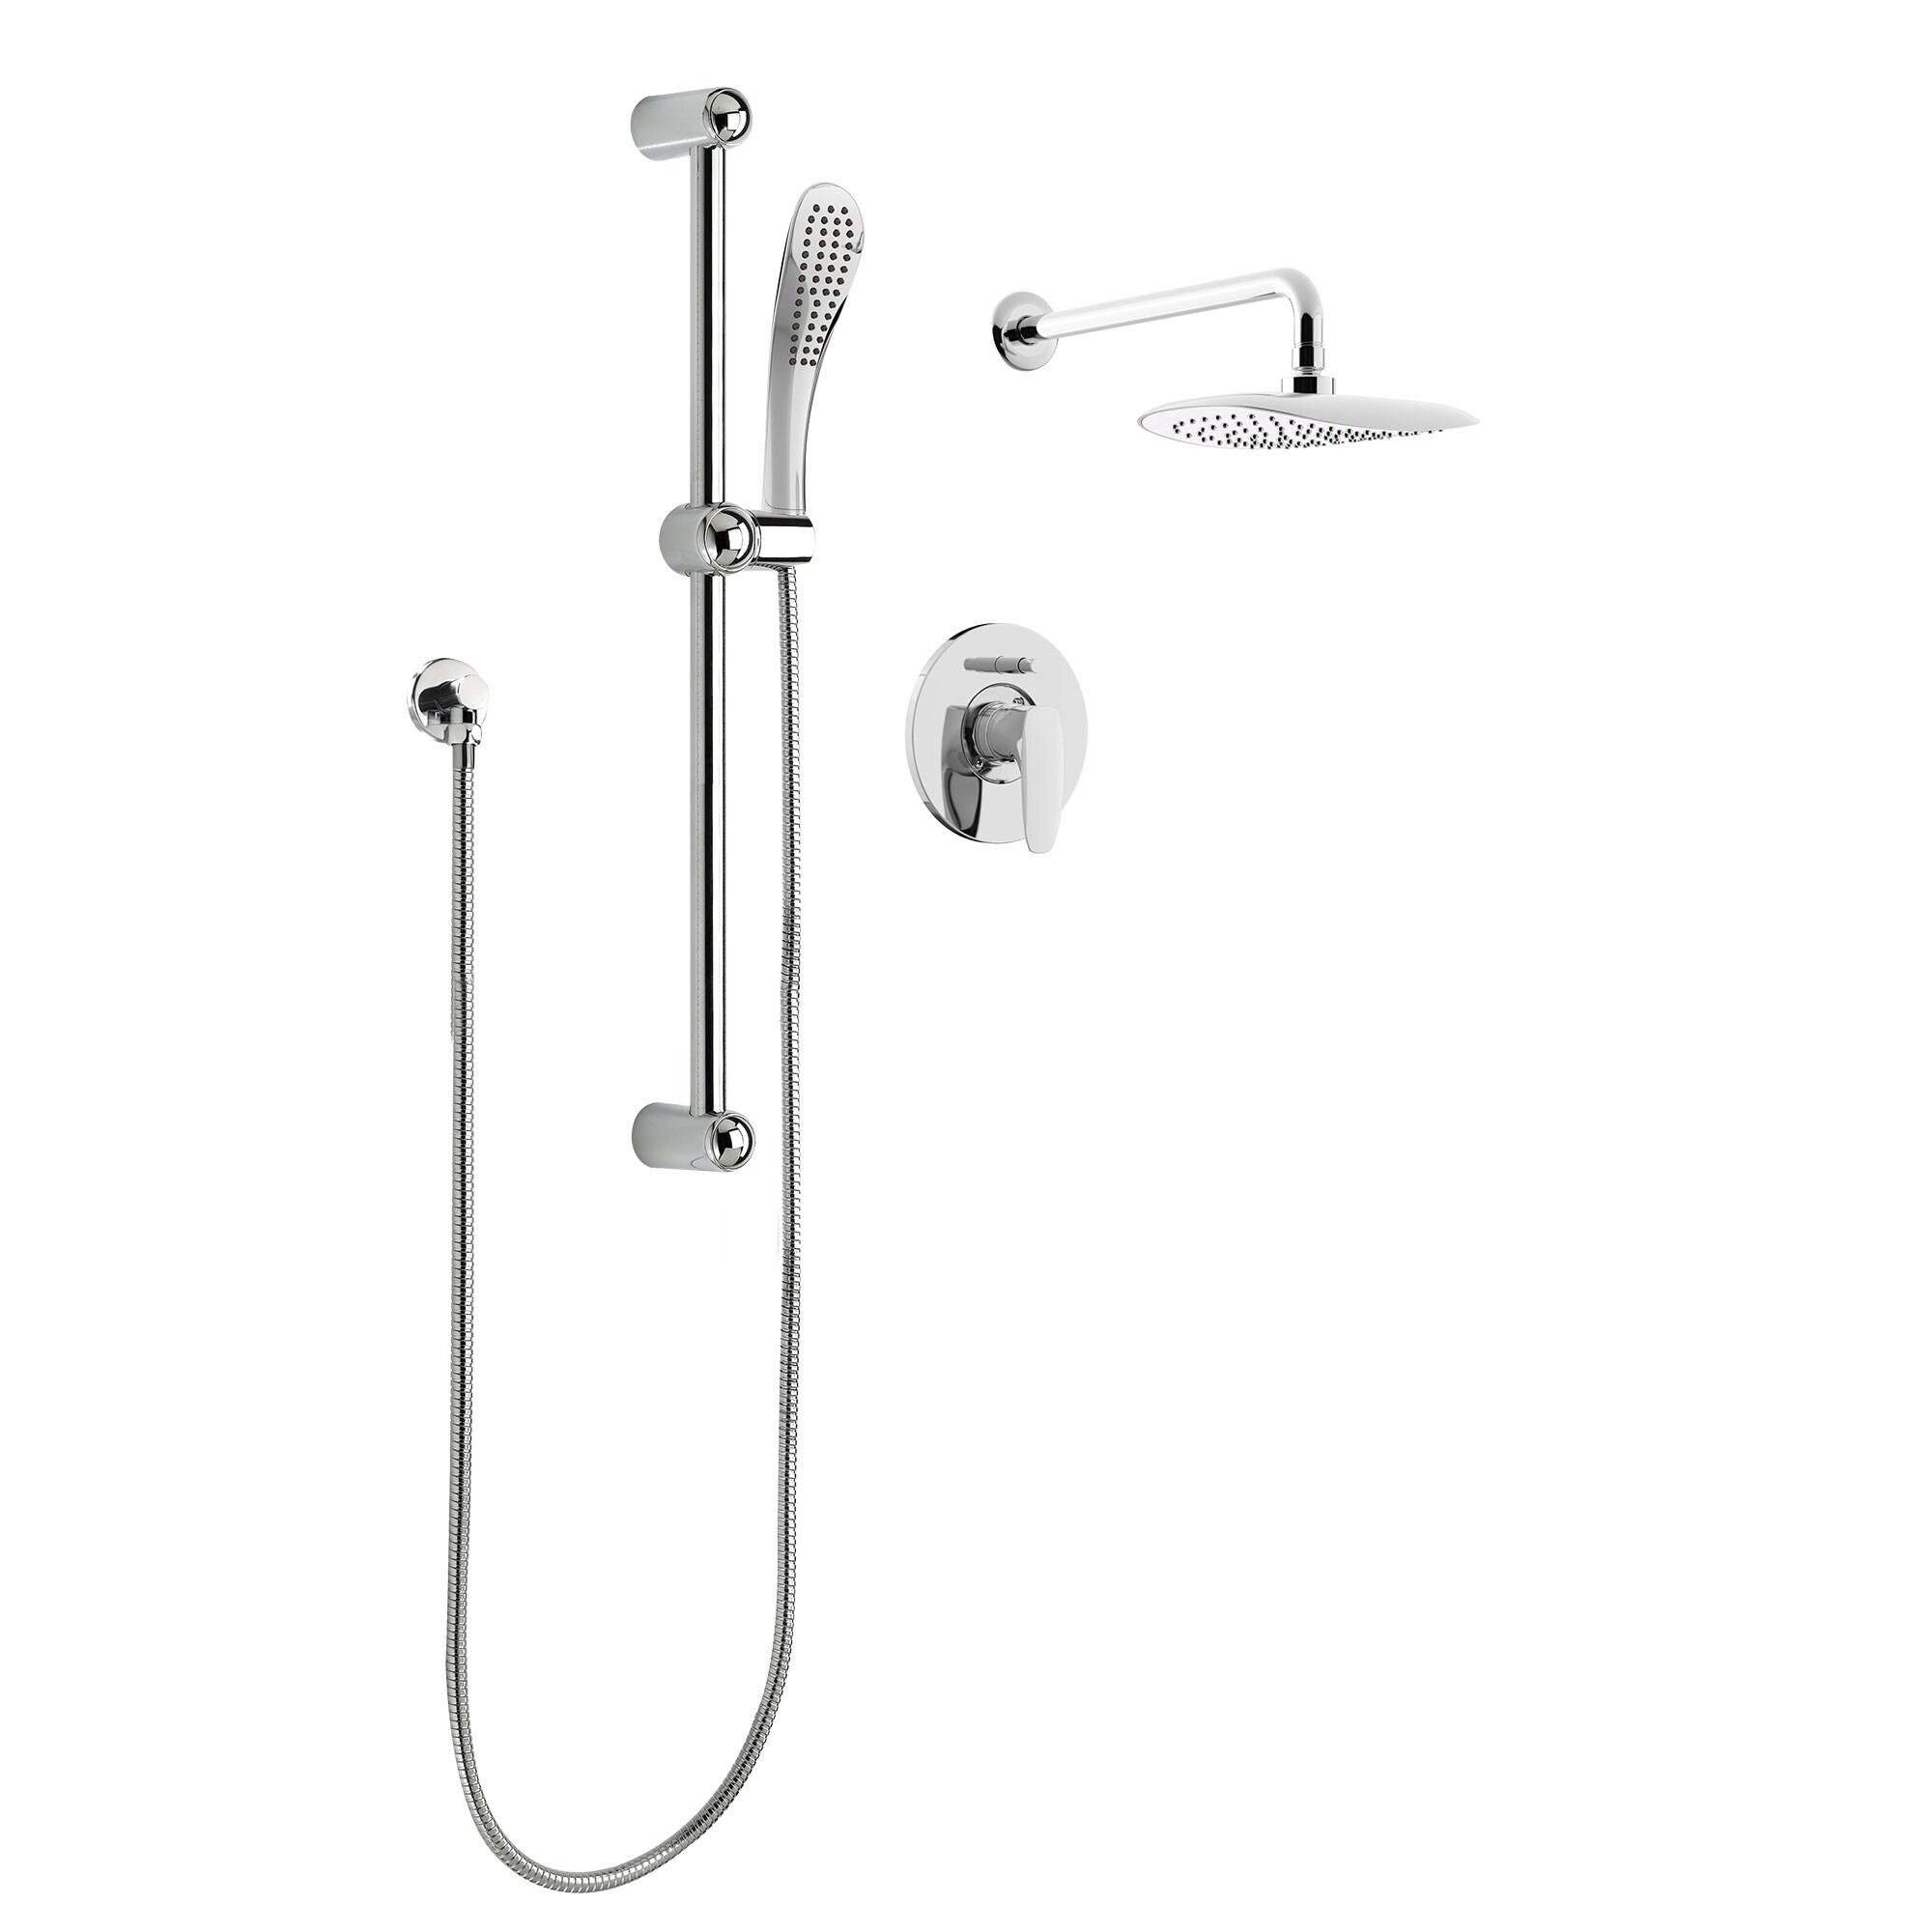 Kit Pur130ccp Oval Rain Shower Faucet With Pressure Balanced Diverter Valve